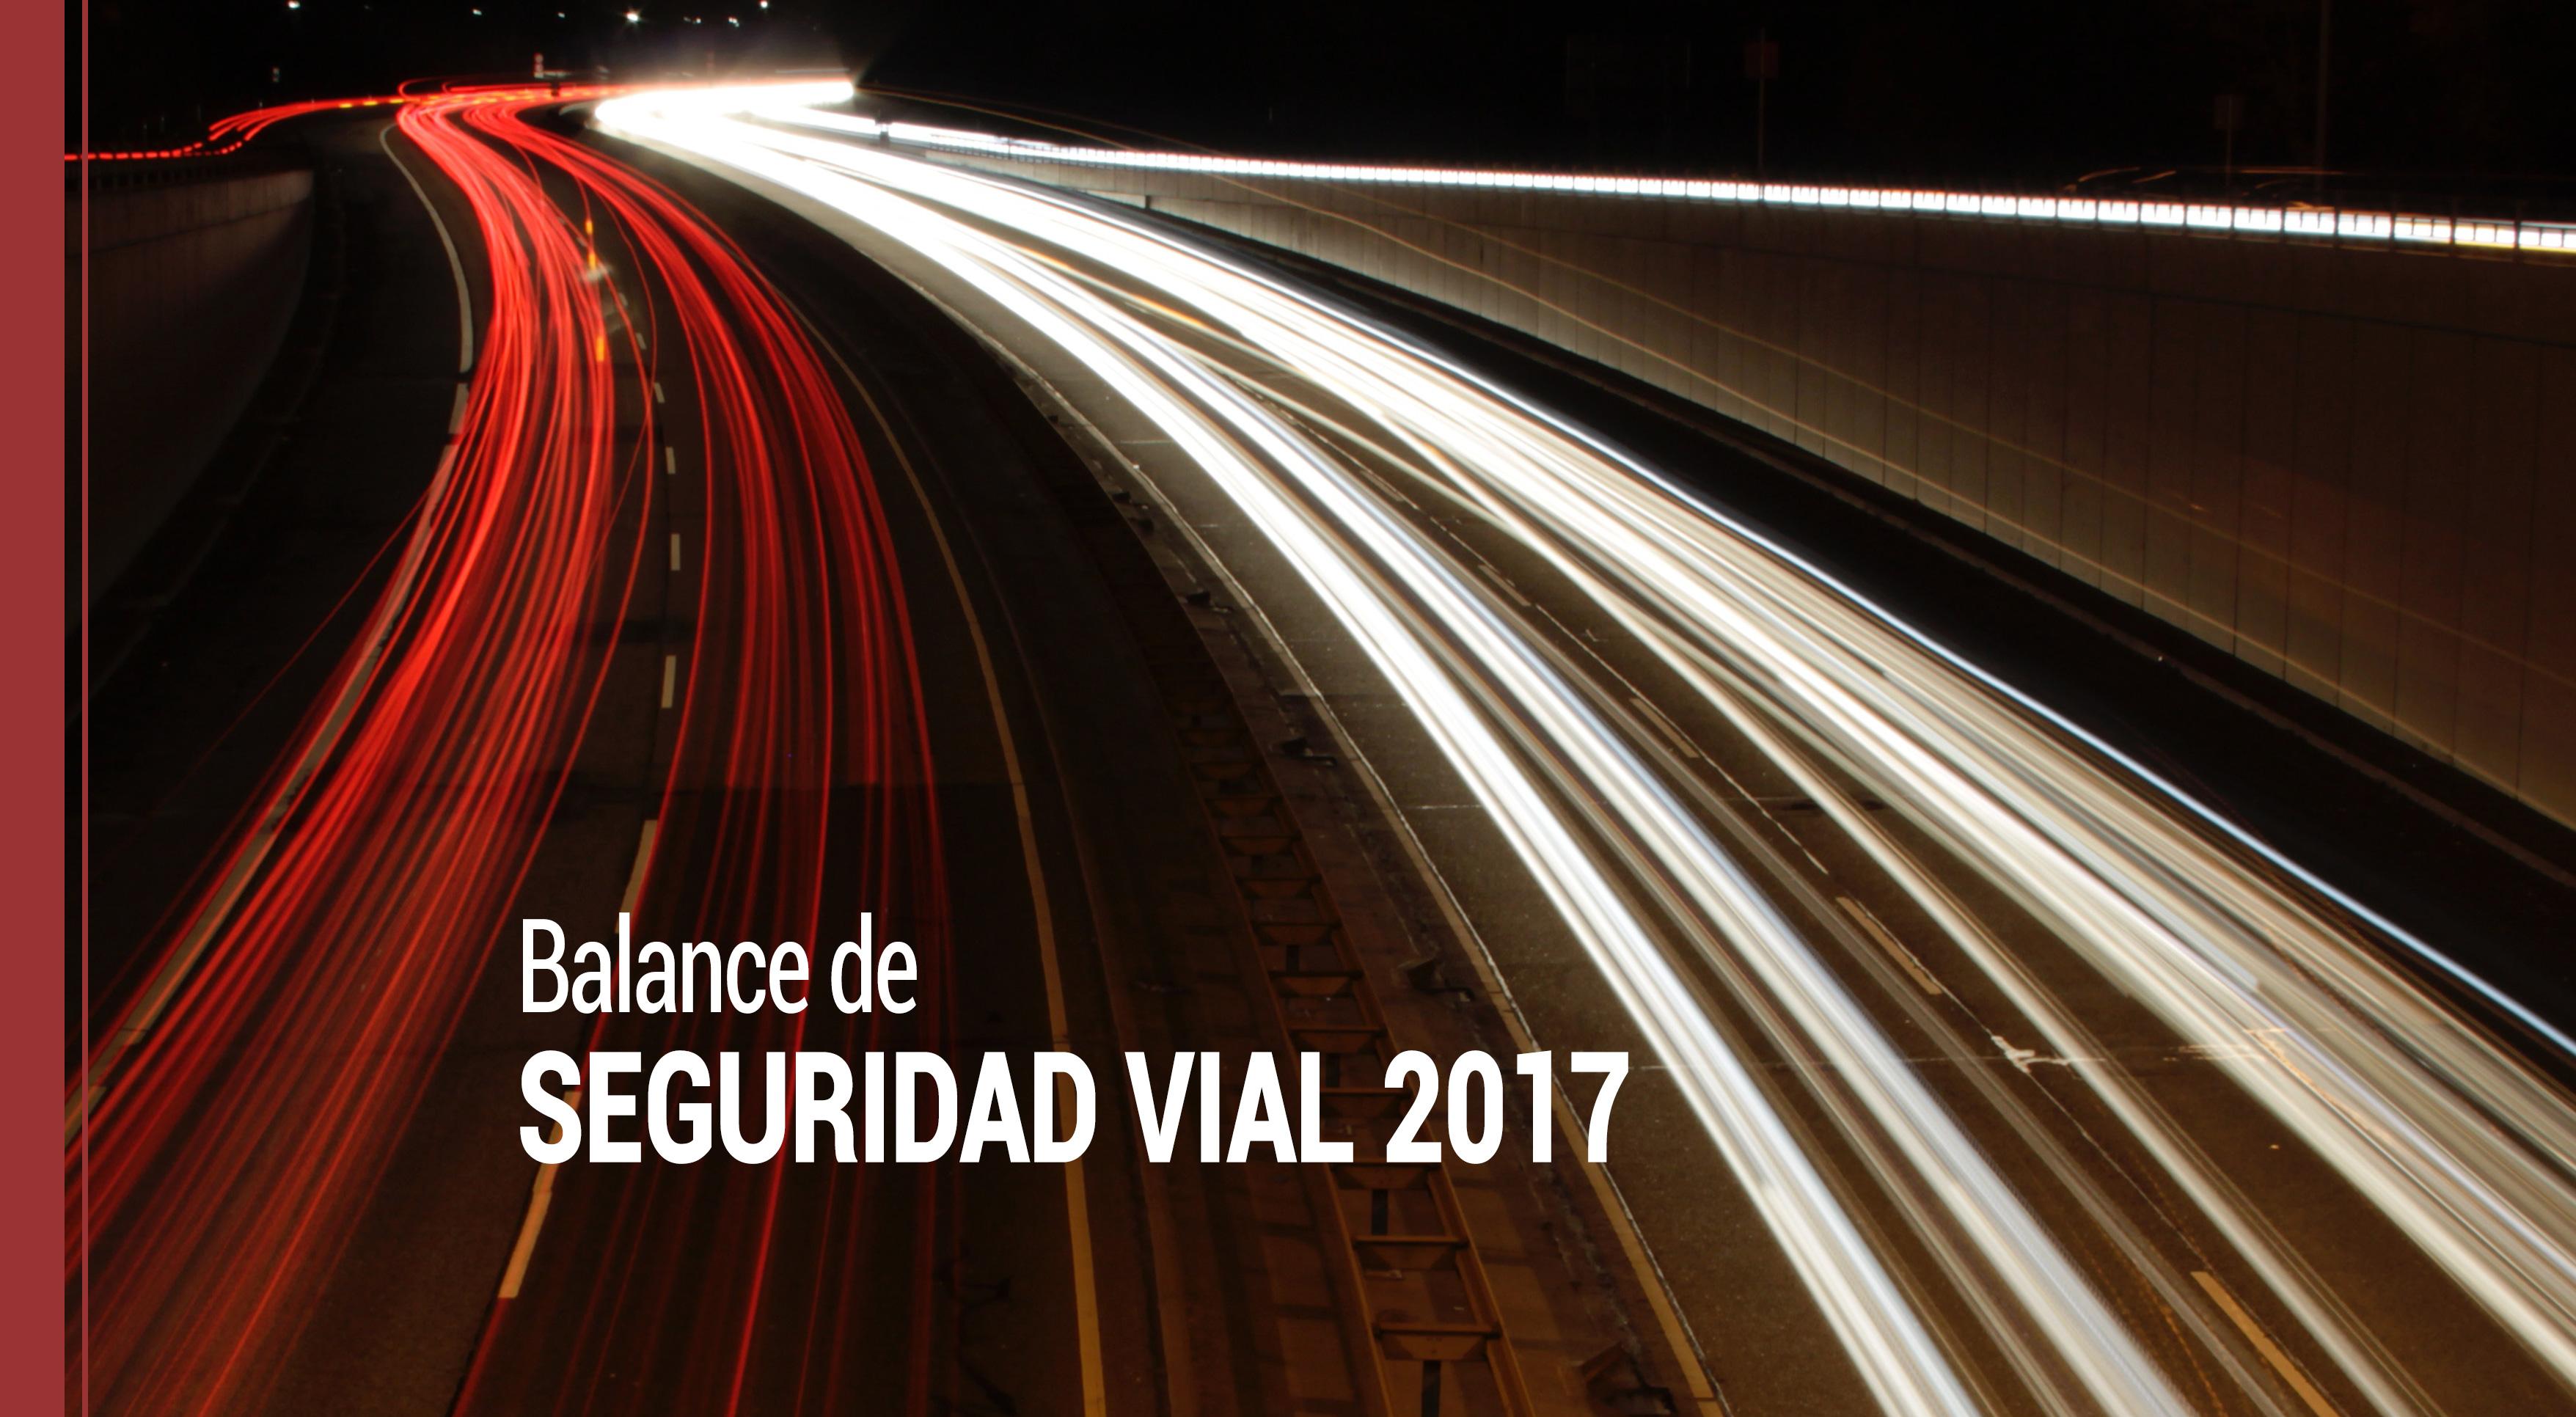 Balance-seguridad-vial-2017